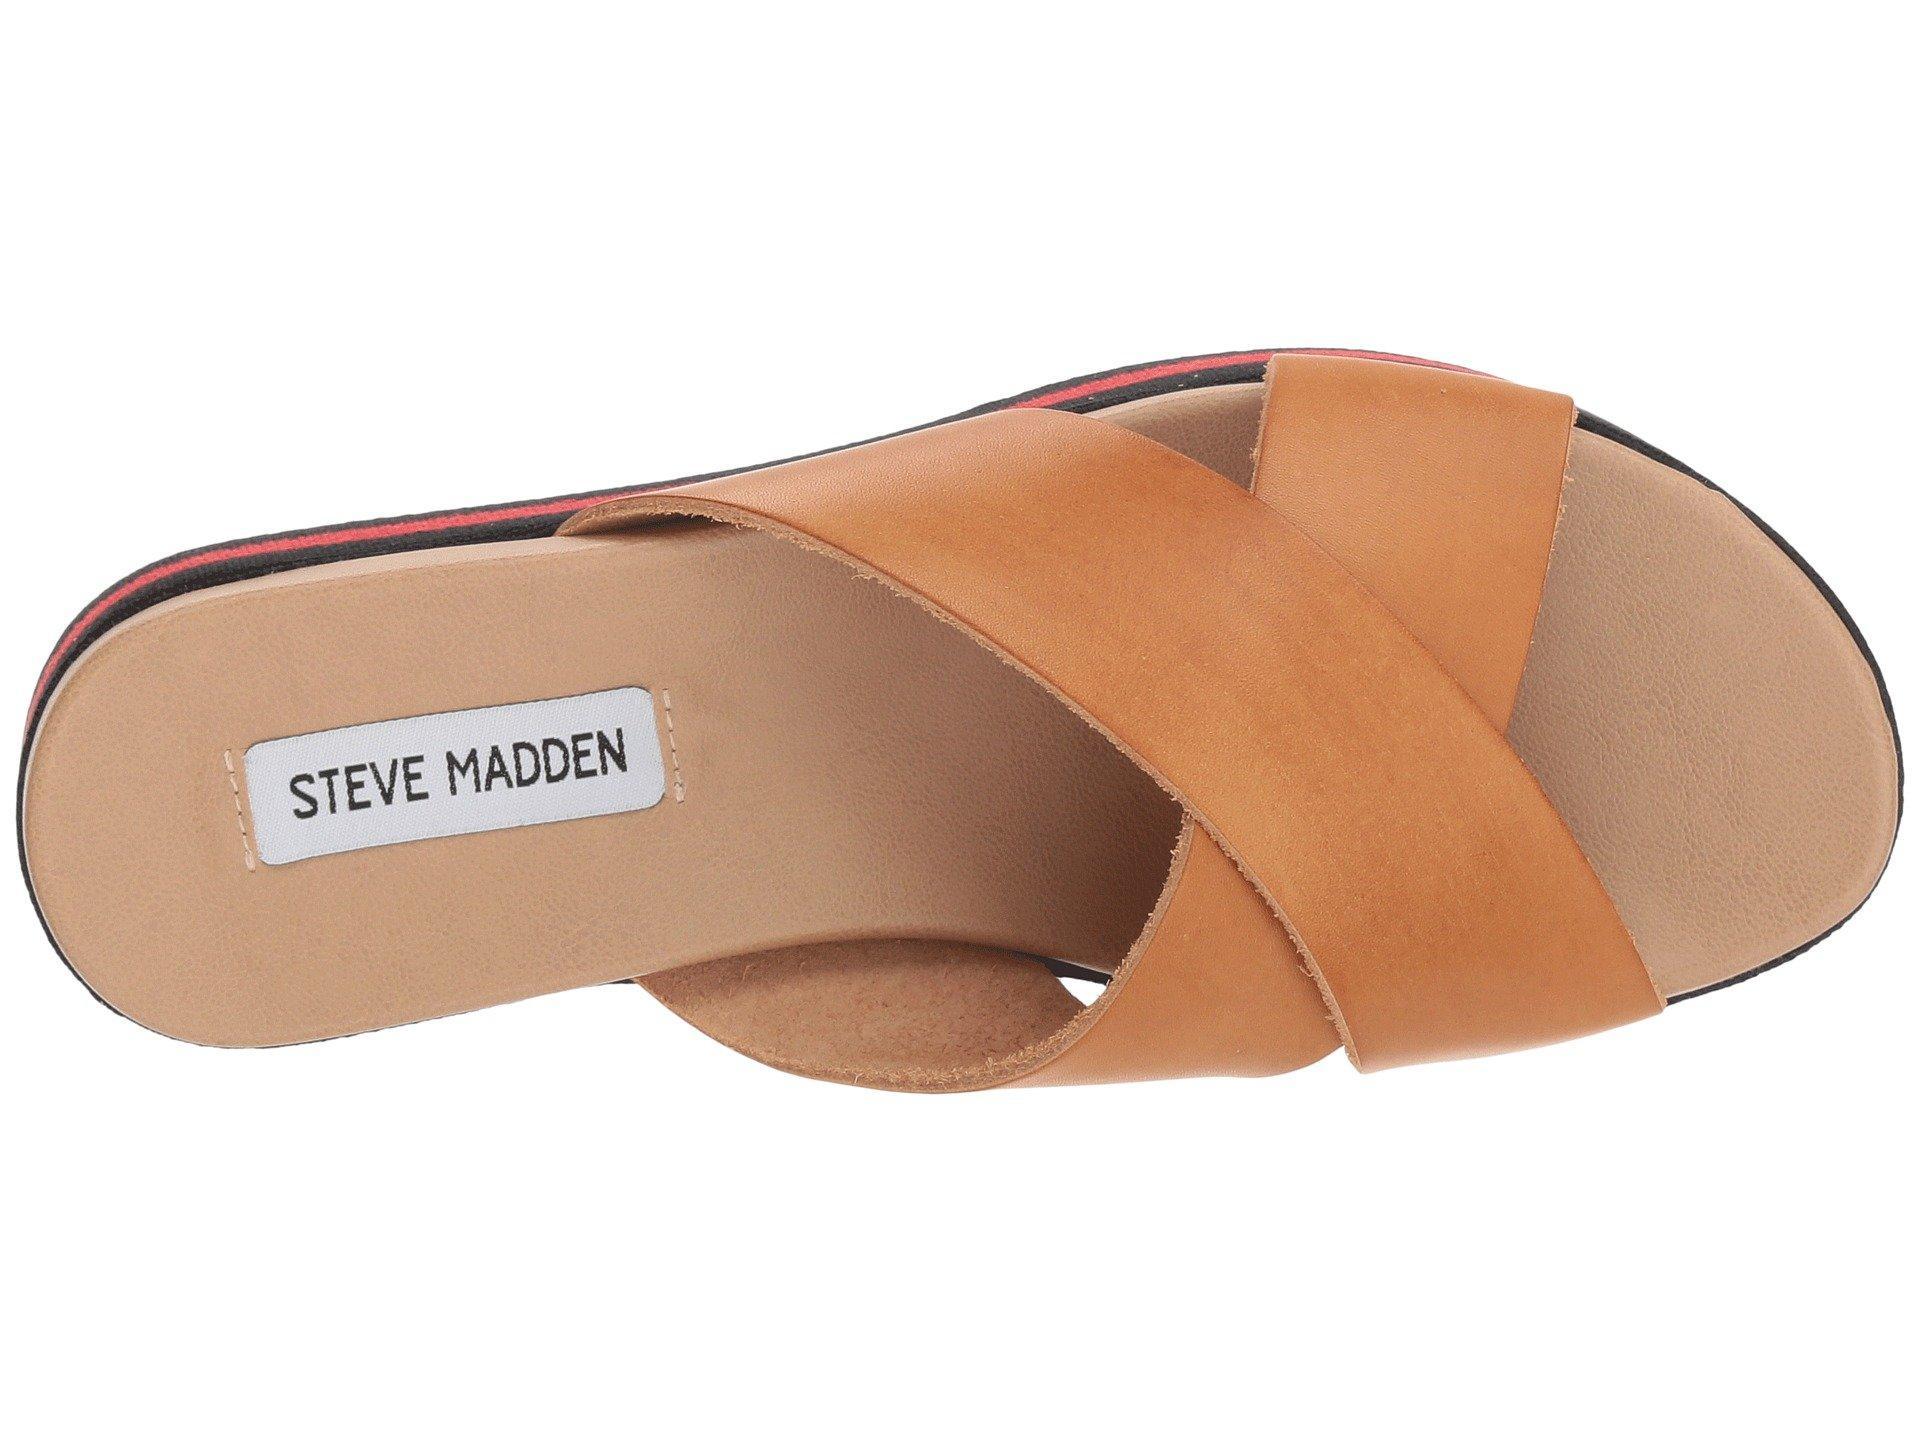 33a01c0cfc5 Steve Madden - Multicolor Asher - Lyst. View fullscreen